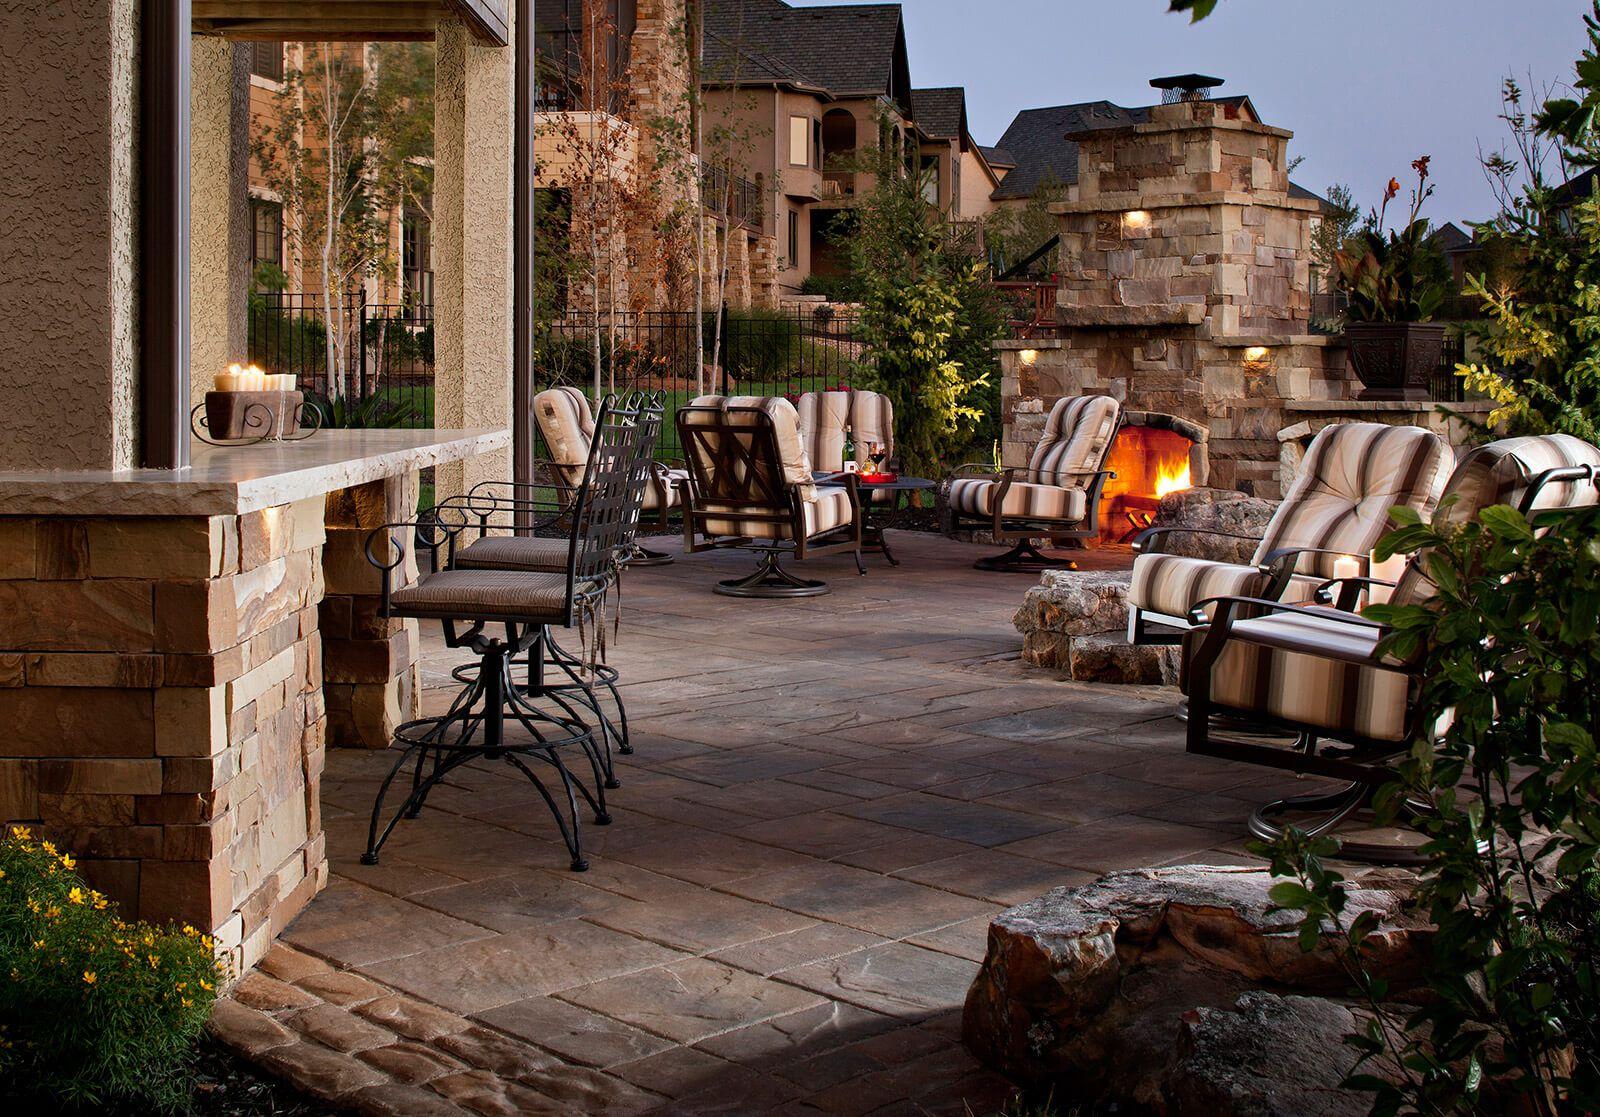 Elite Landscape & Outdoor Living - Denver, Colorado ... on Elite Landscape And Outdoor Living id=42089